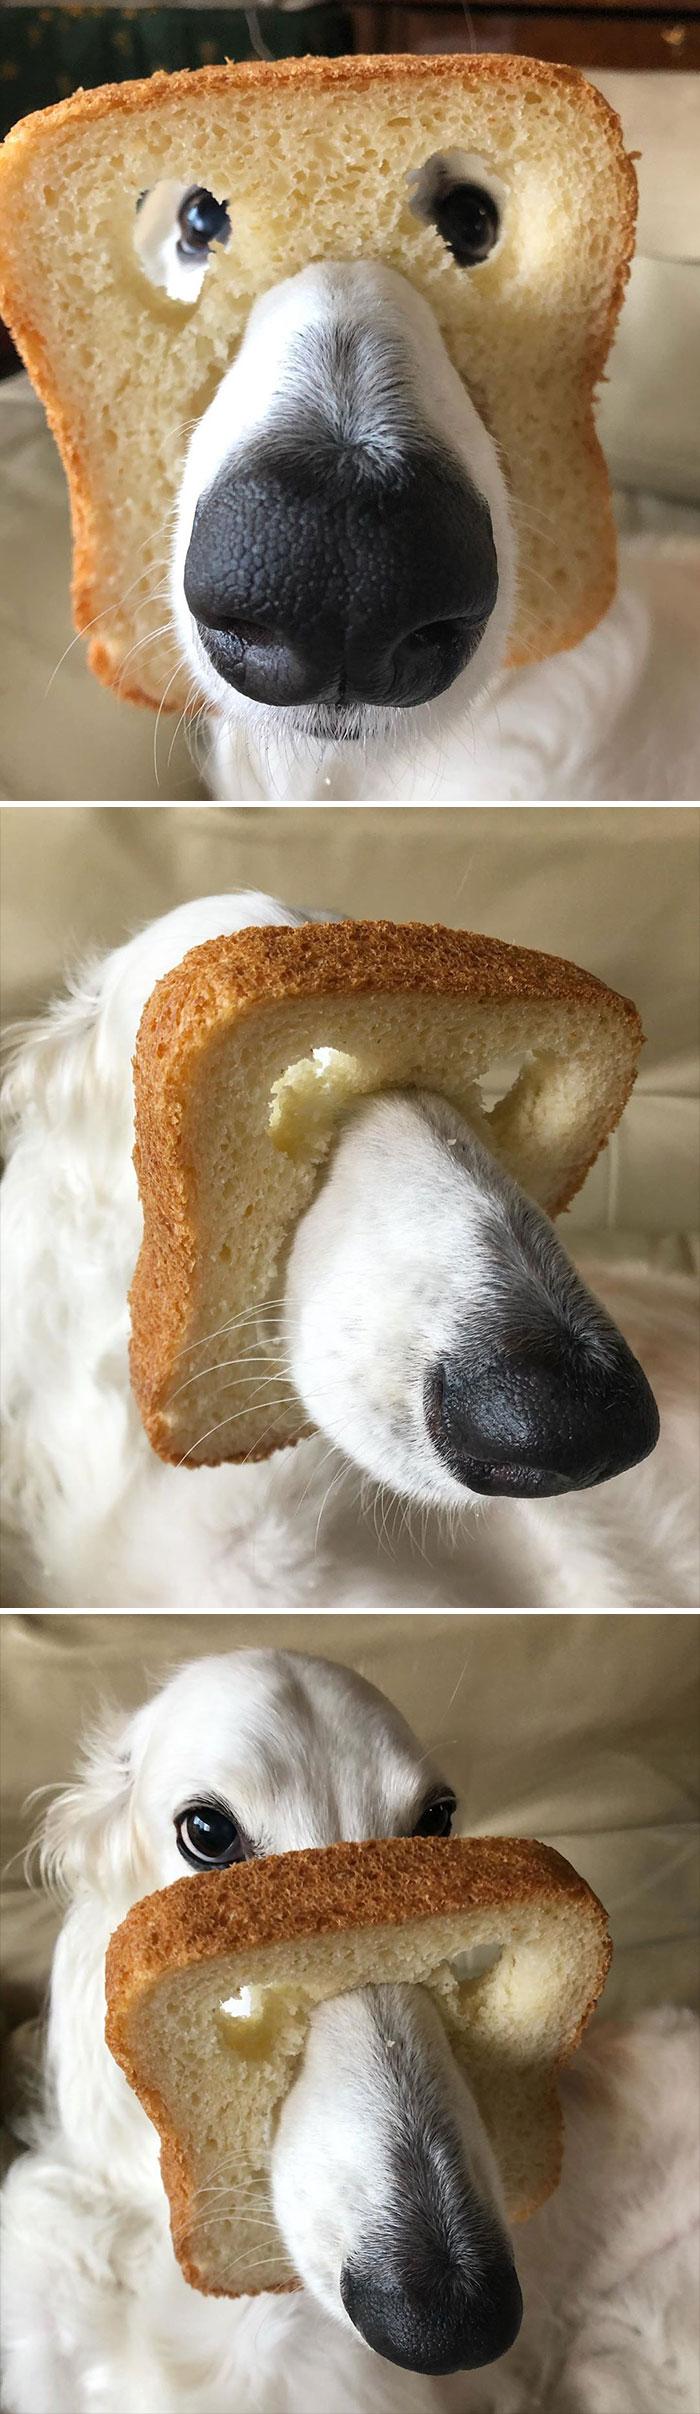 Purebread Or Inbread Doggo?